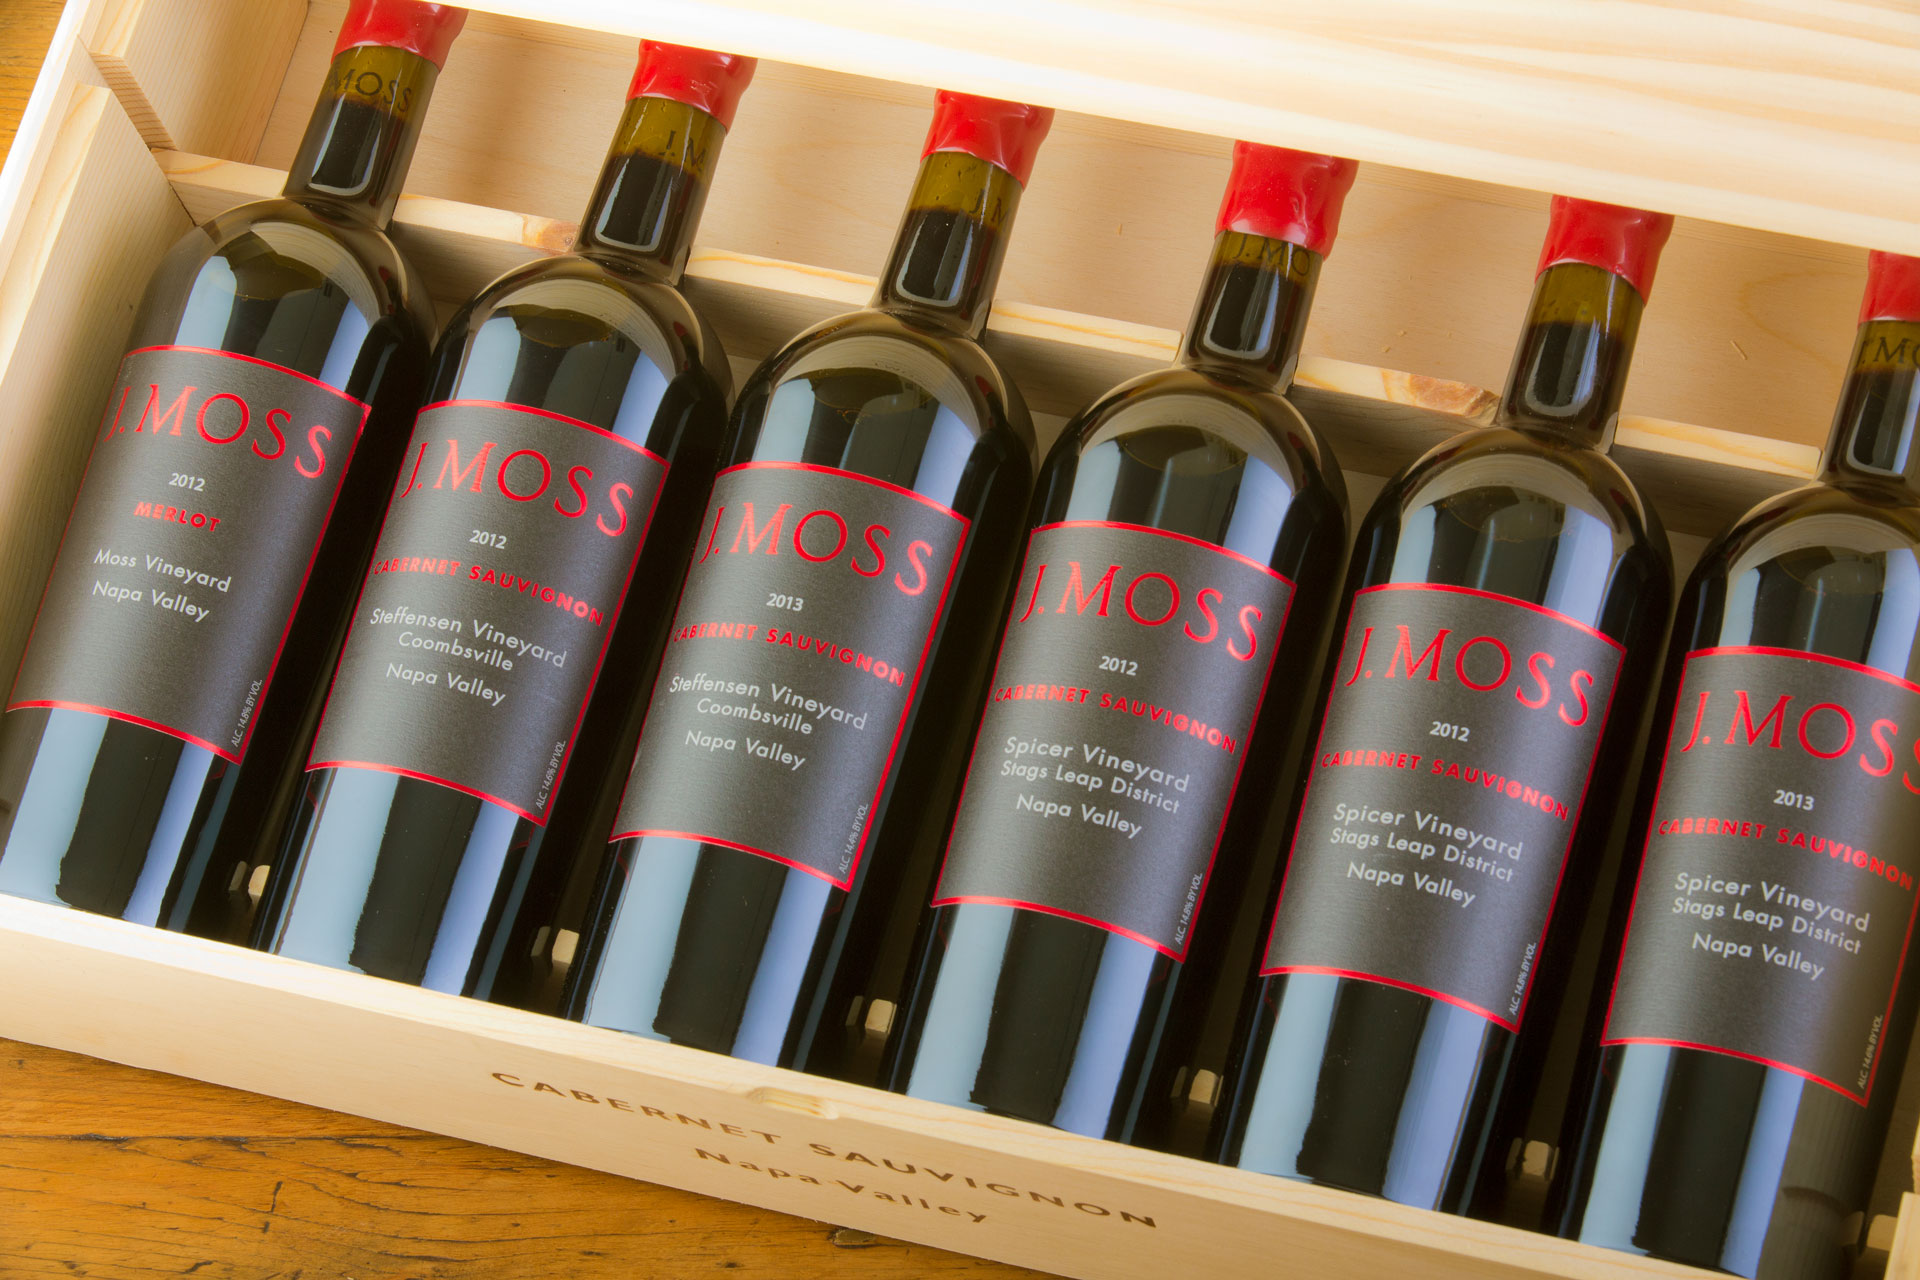 J. Moss Wines